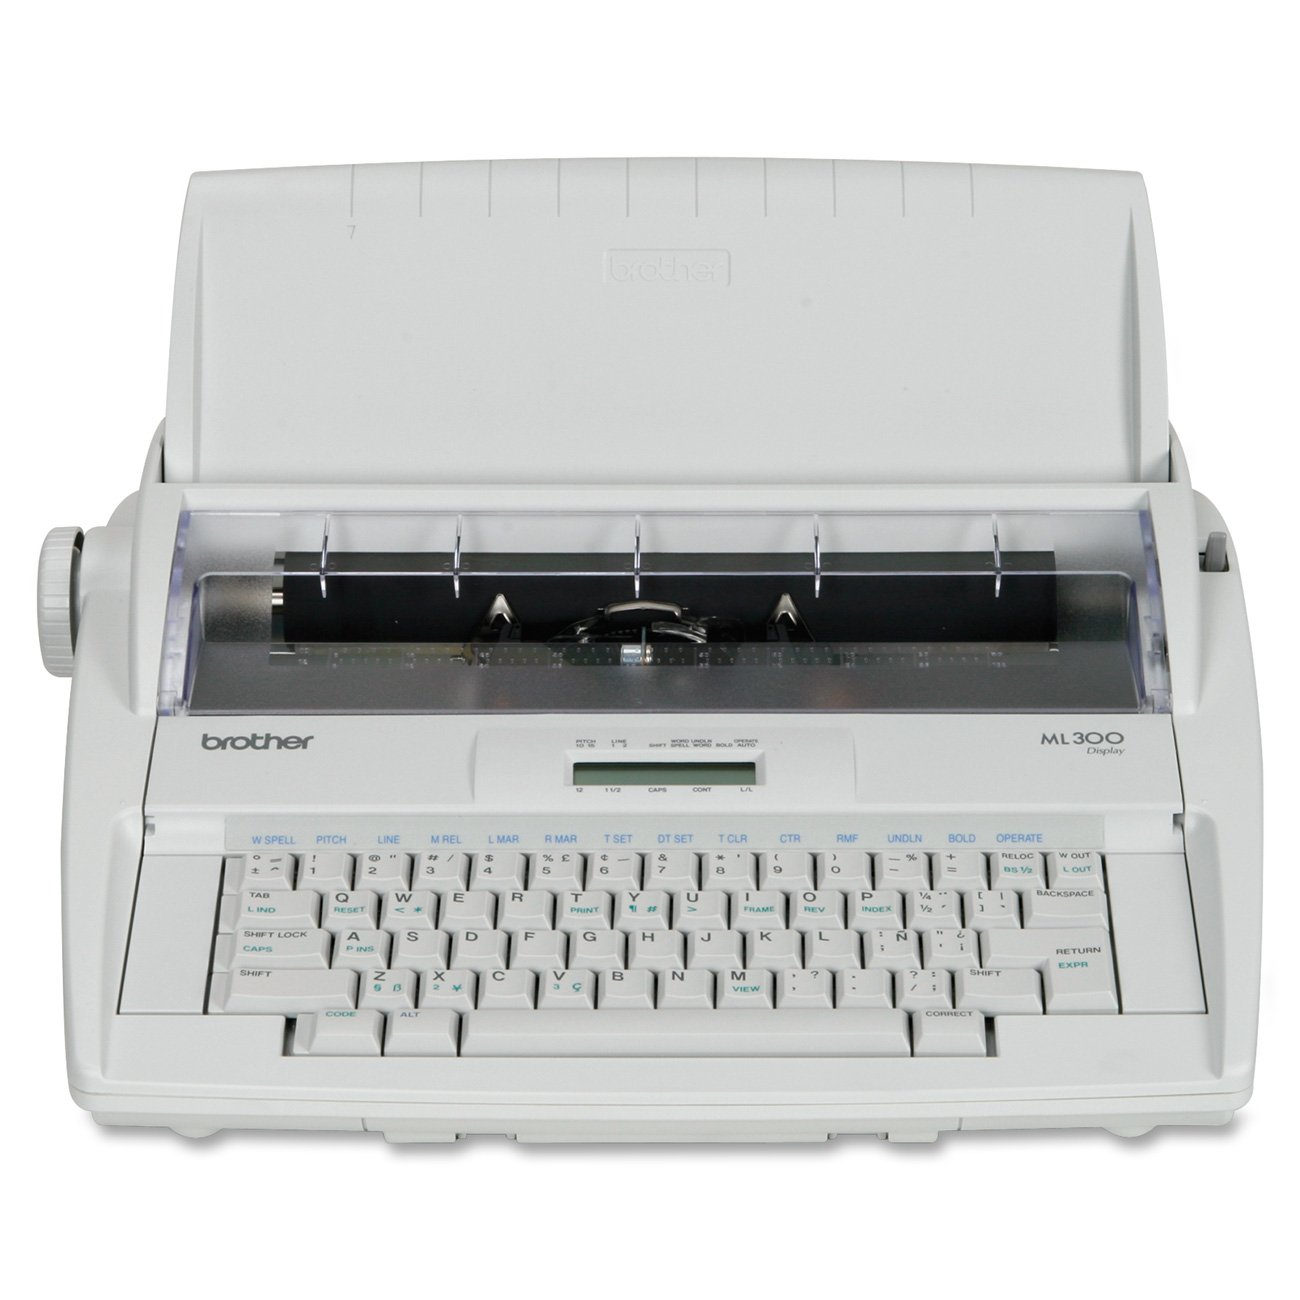 Brother ML-300 Electronic Display Typewriter - Retail Packaging product image